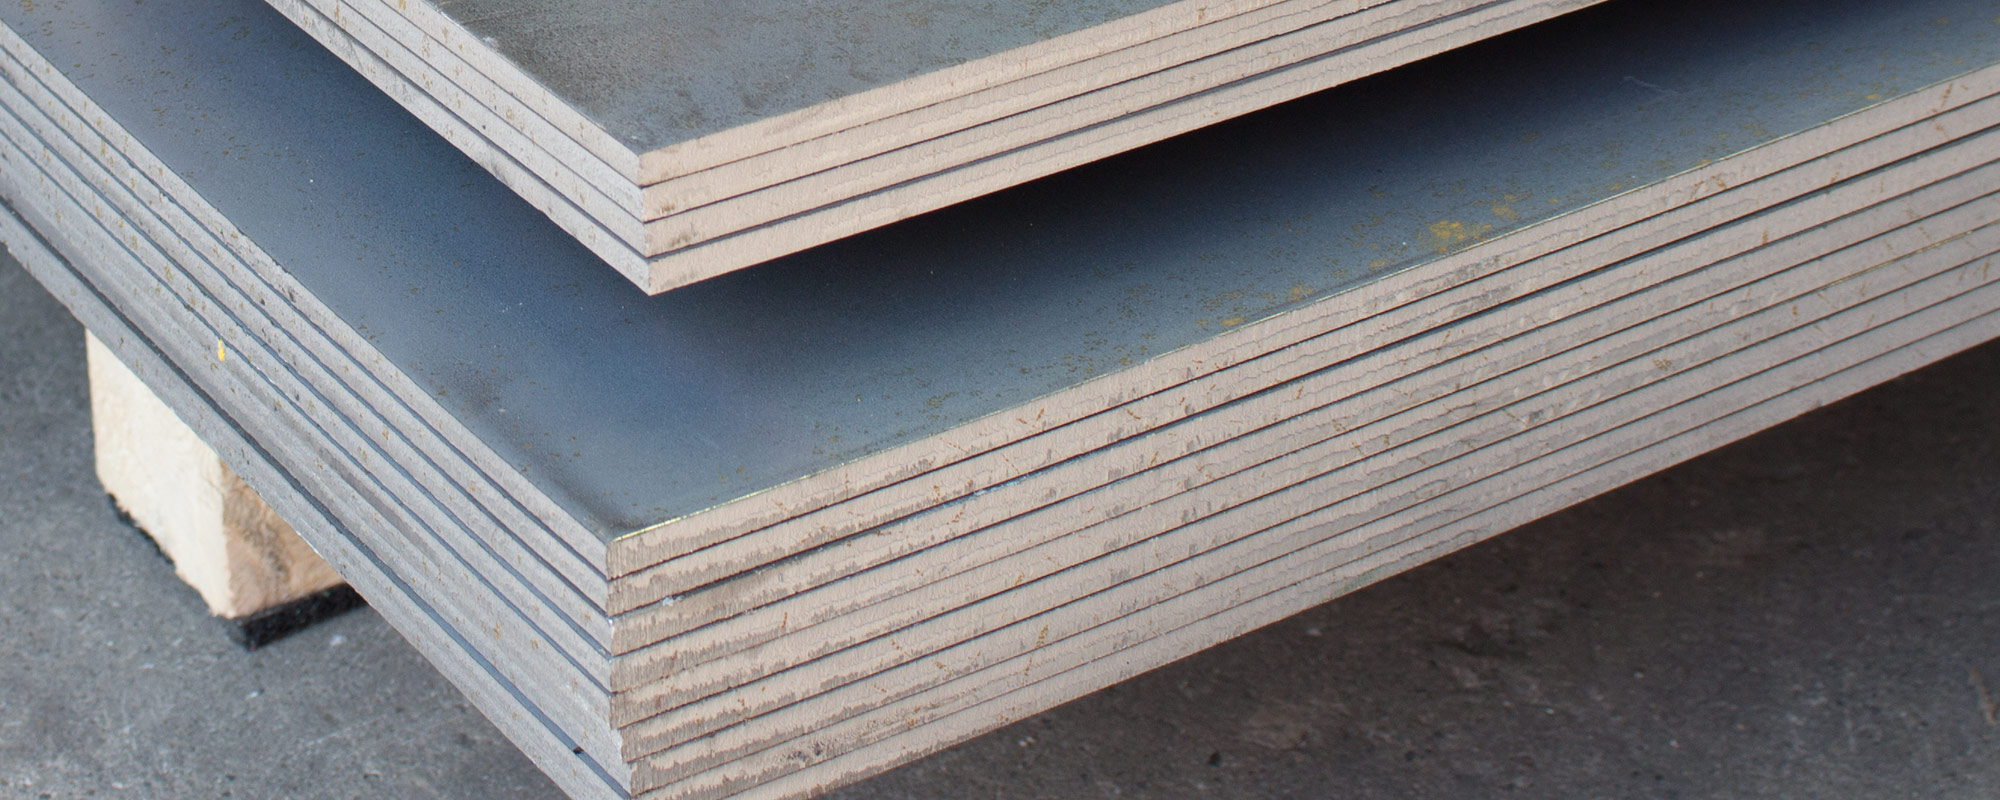 manganese-steel-sheets